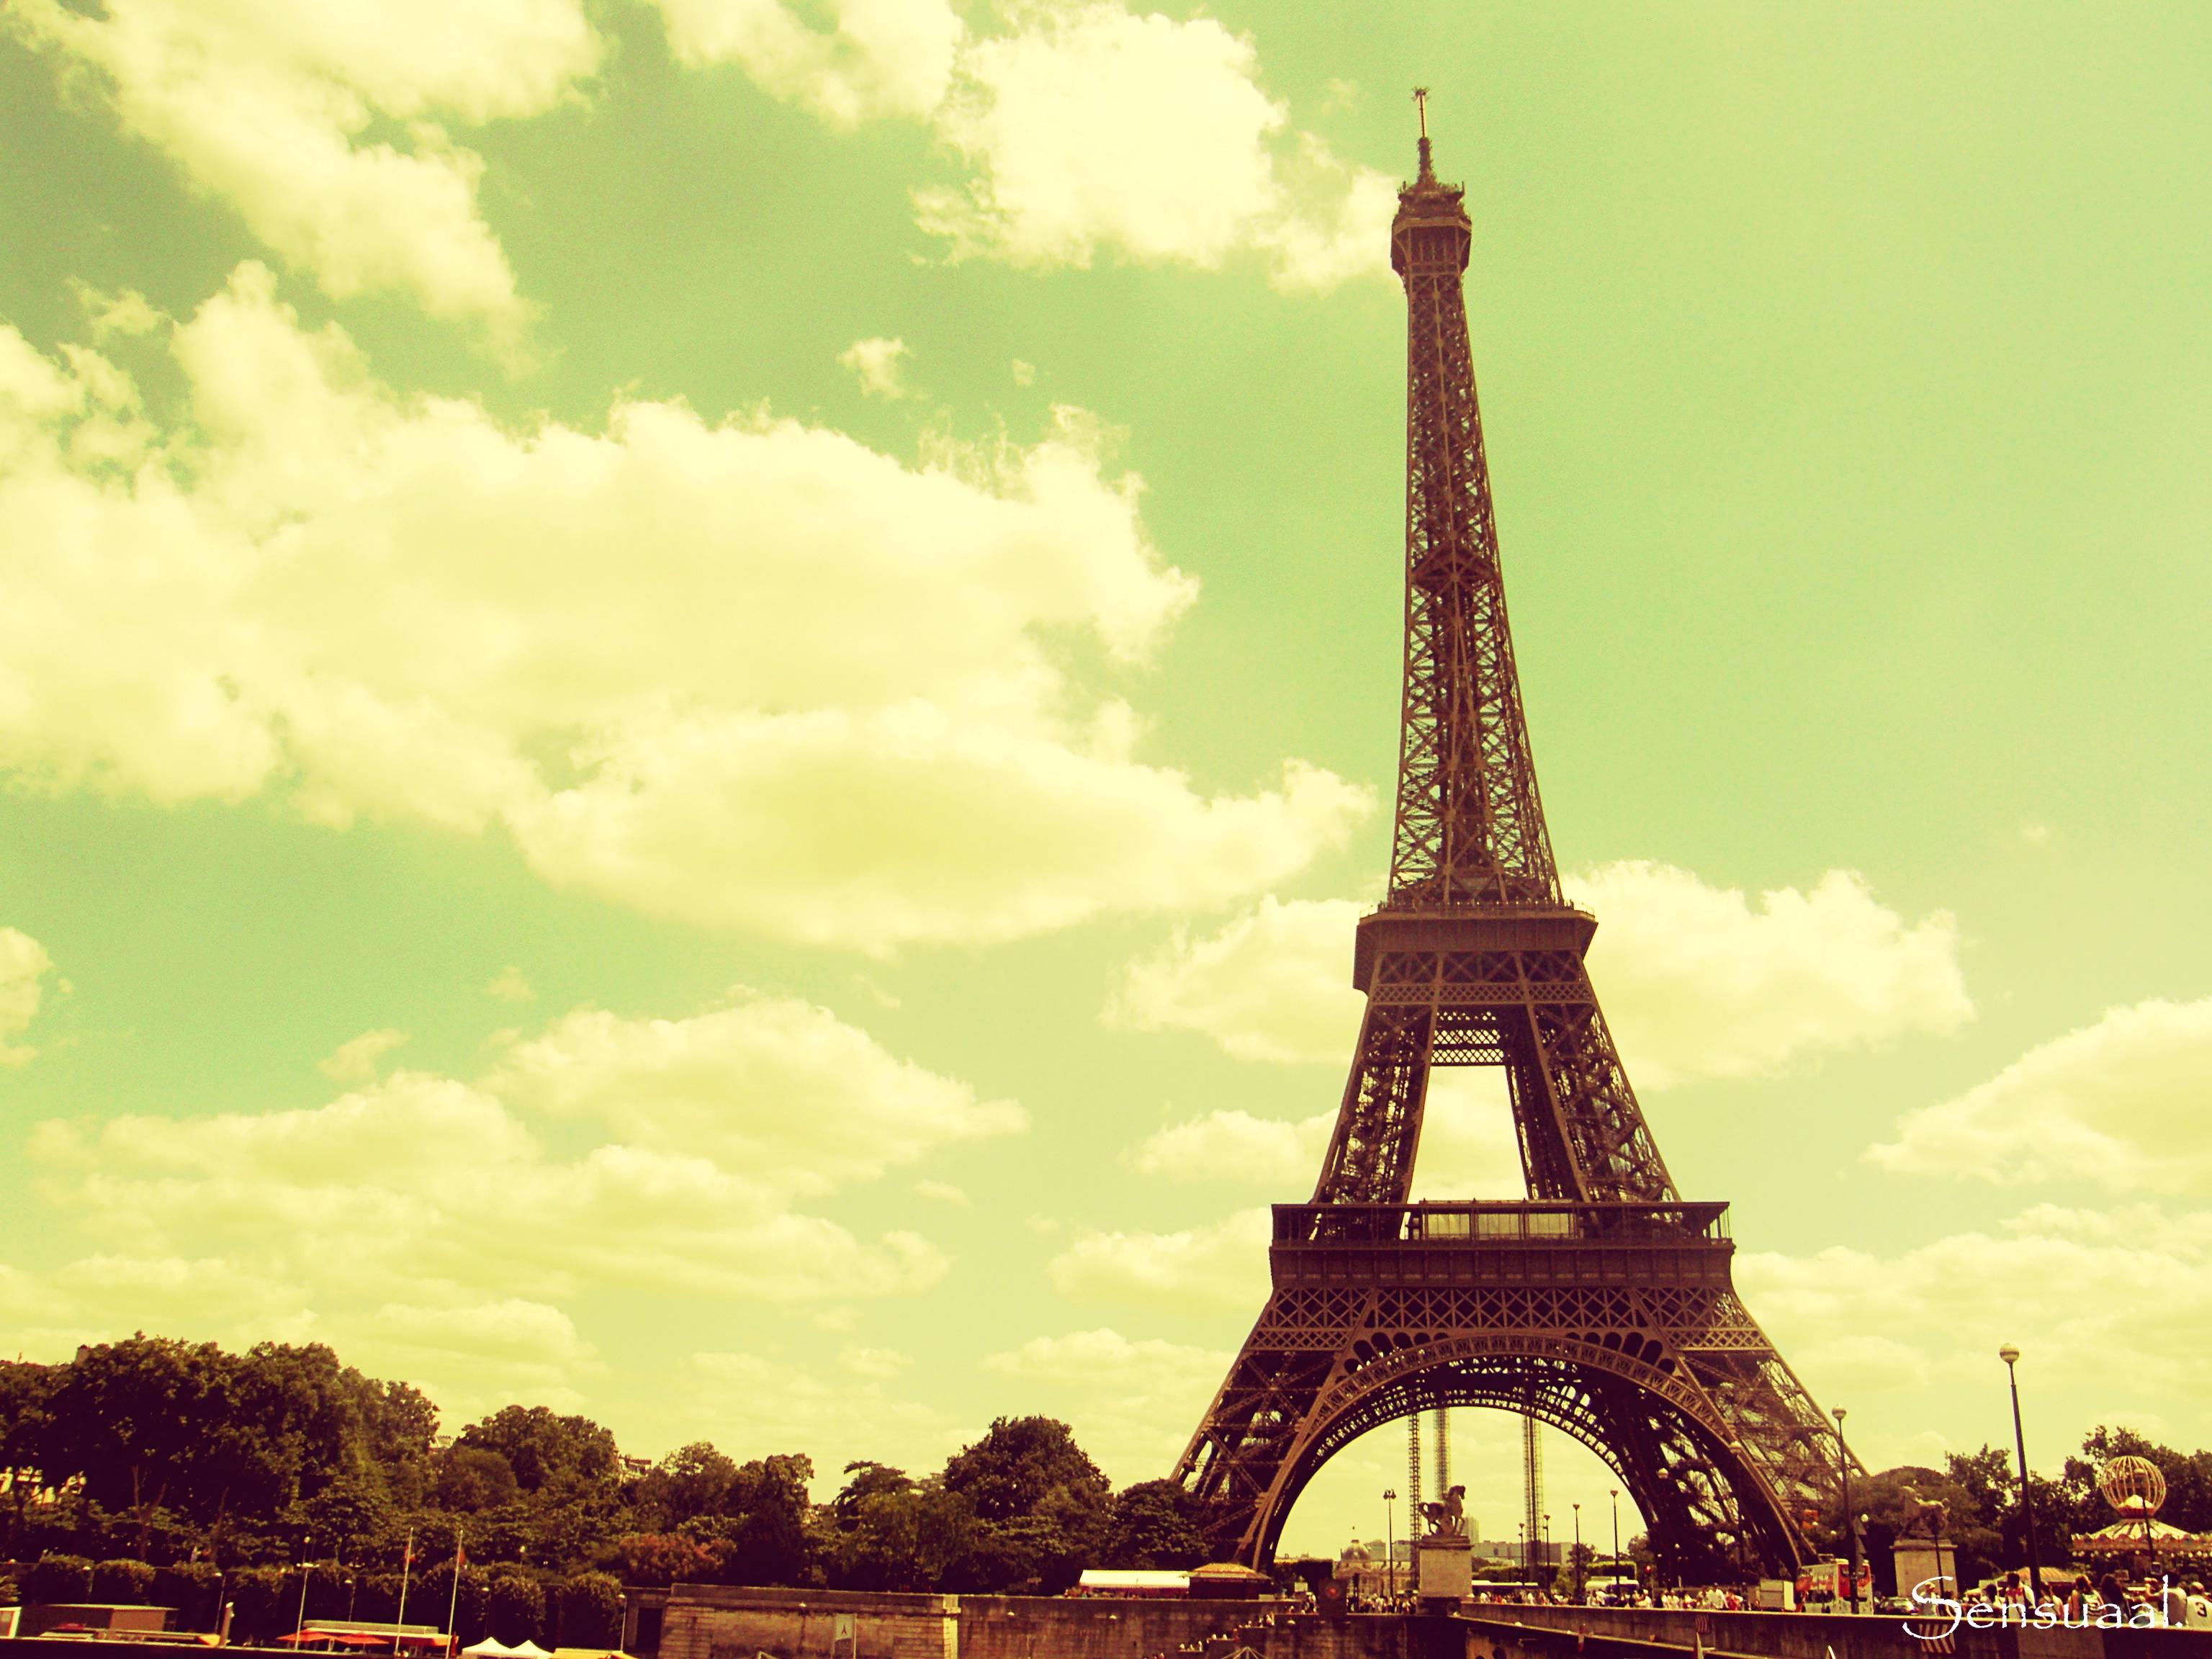 Hd wallpaper eiffel tower - Eiffel Tower Wallpaper Free Download Walljpeg Com